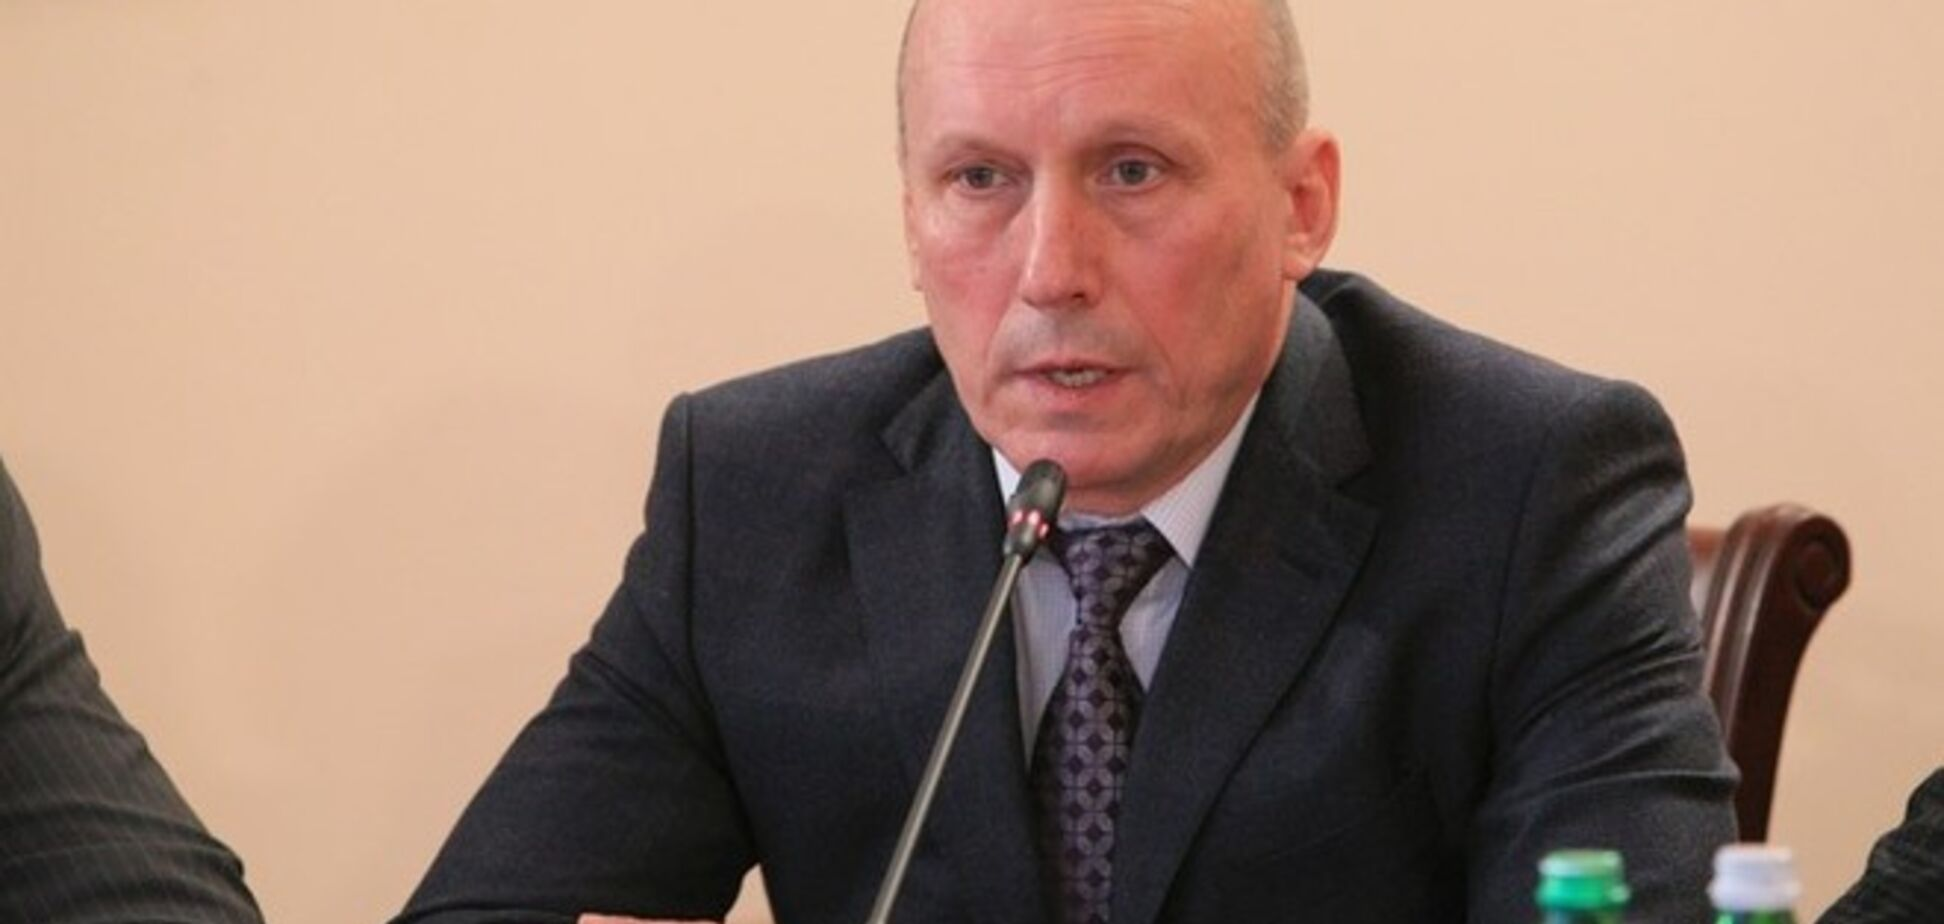 На экс-главу 'Нафтогаза' Бакулина завели дело за подкуп избирателей